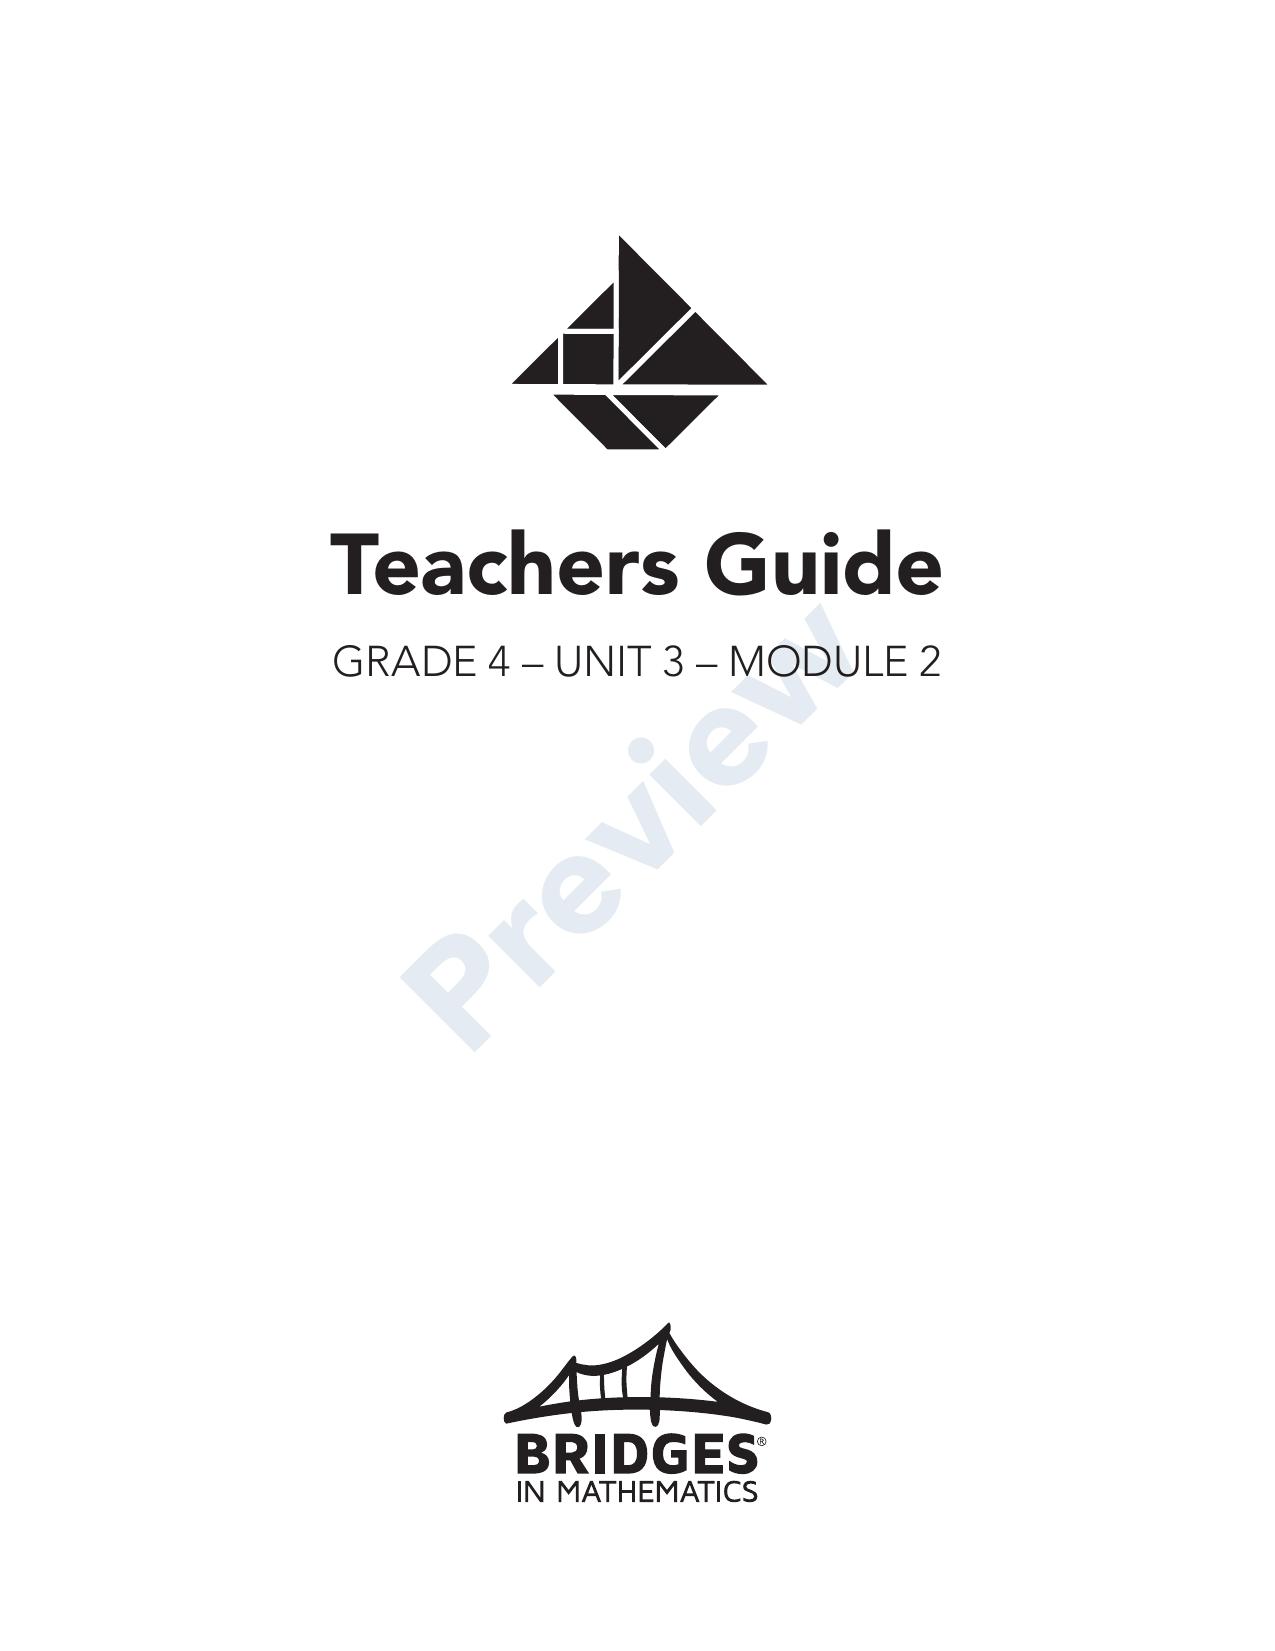 hight resolution of Bridges in Mathematics Grade 4 Teachers Guide   Manualzz